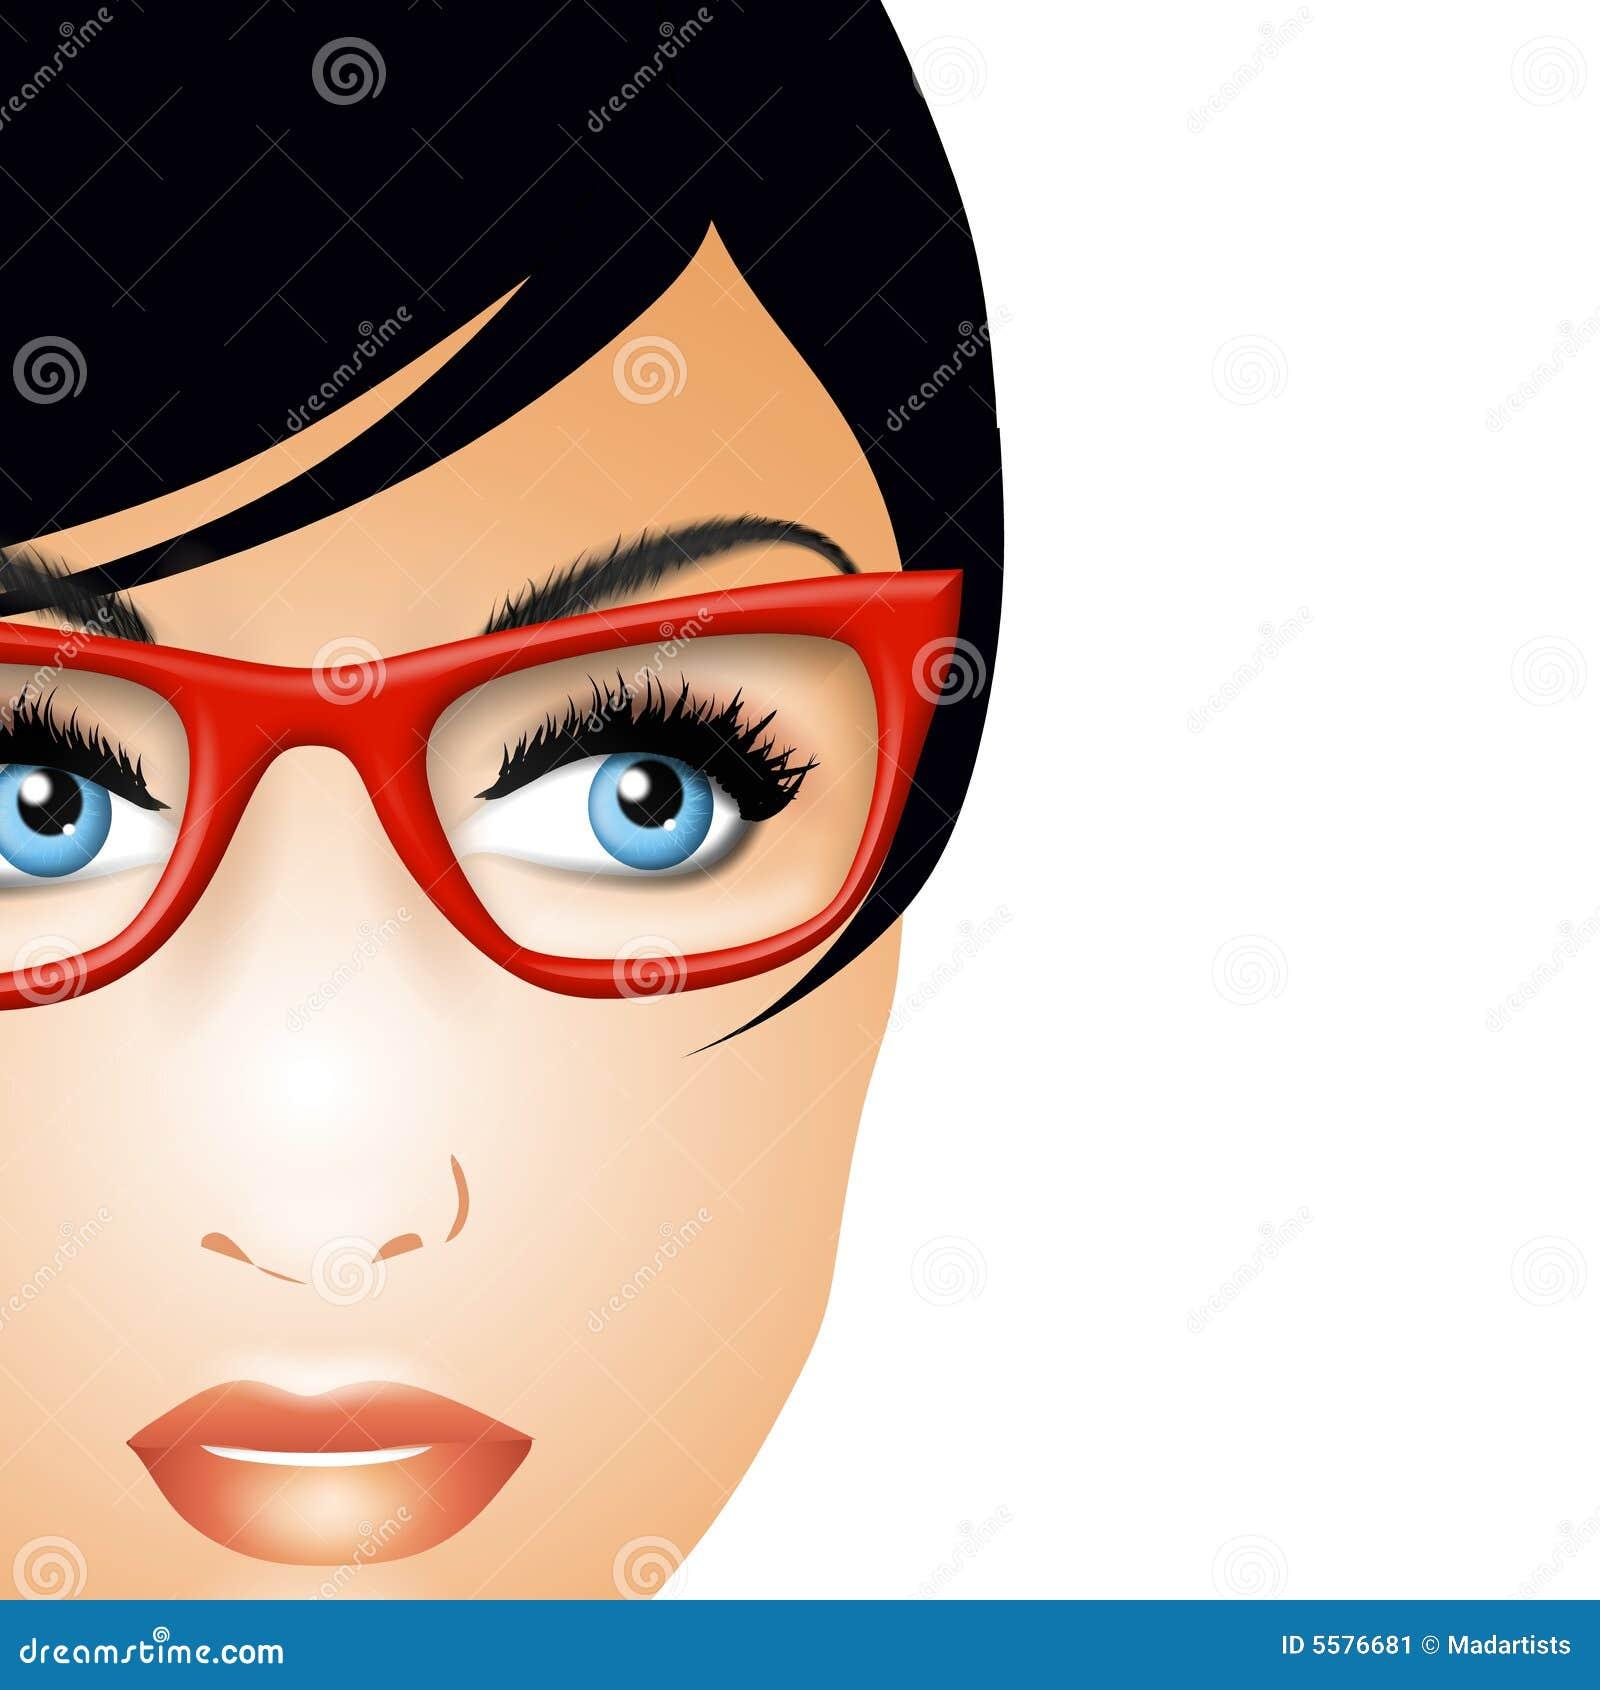 clipart girl glasses - photo #46